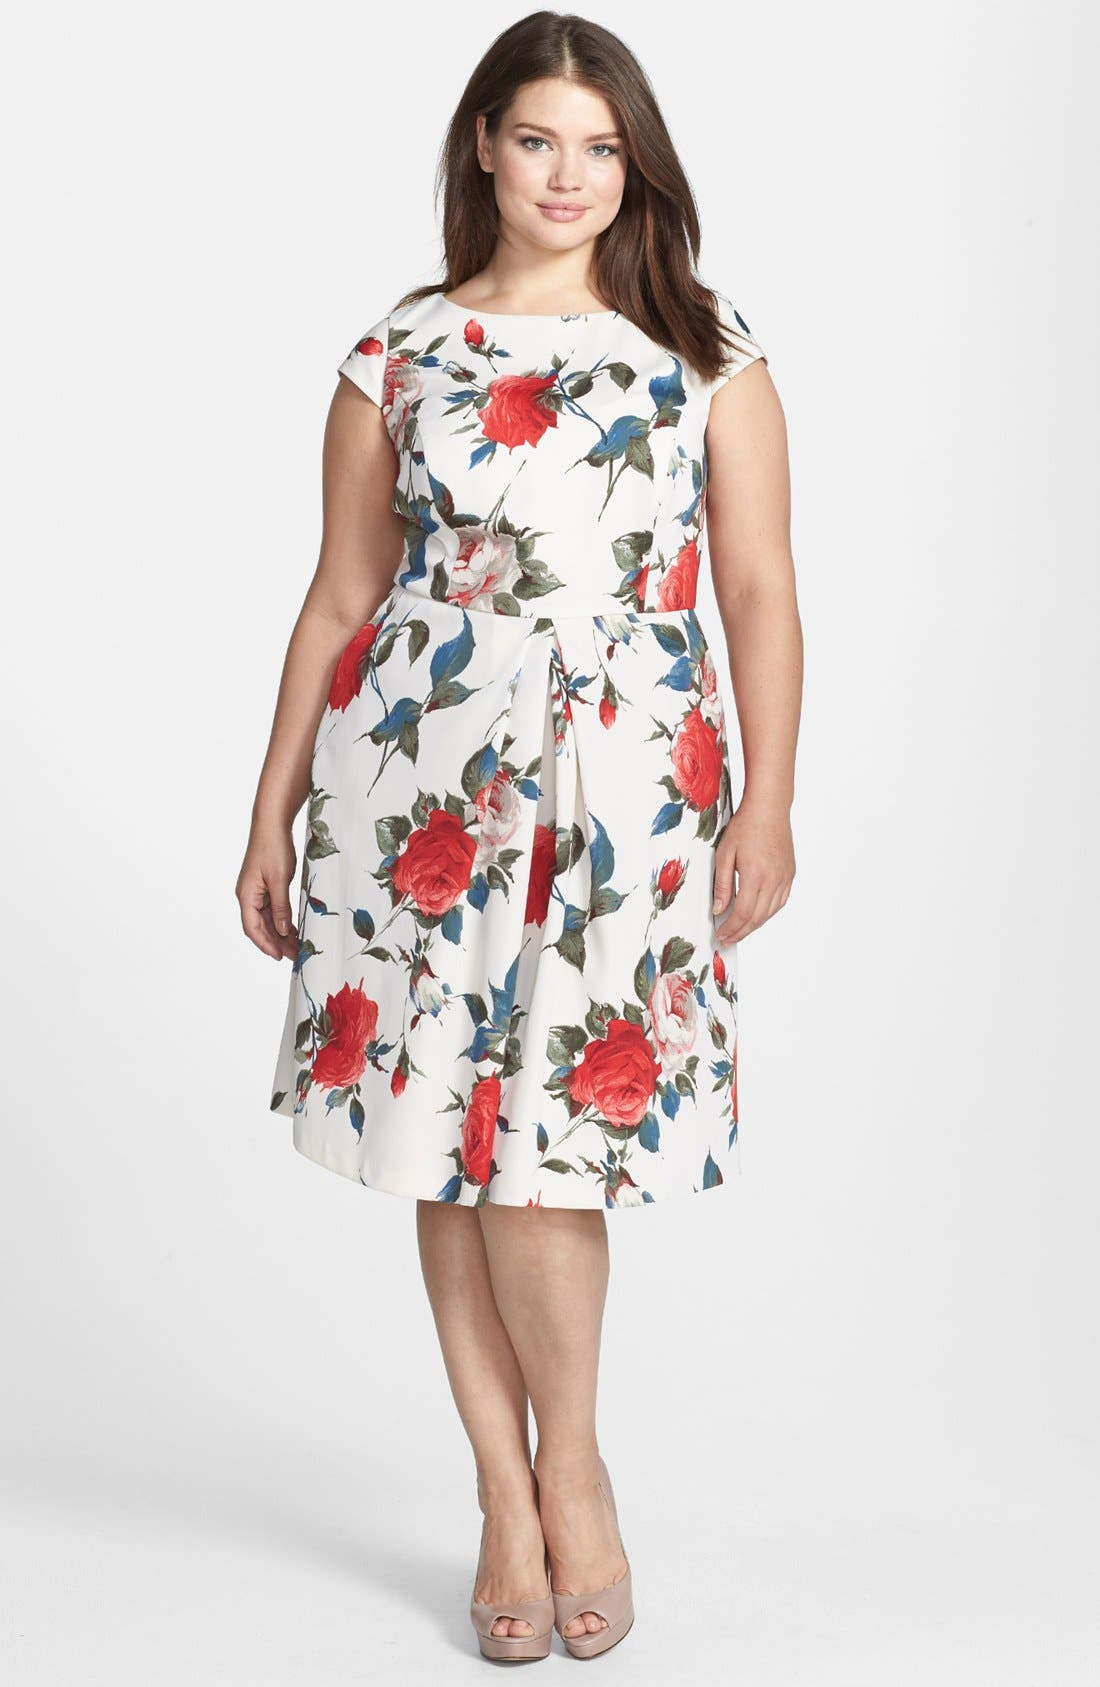 Alternate Image 1 Selected - ABS by Allen Schwartz Vintage Floral Print Fit & Flare Dress (Plus Size)